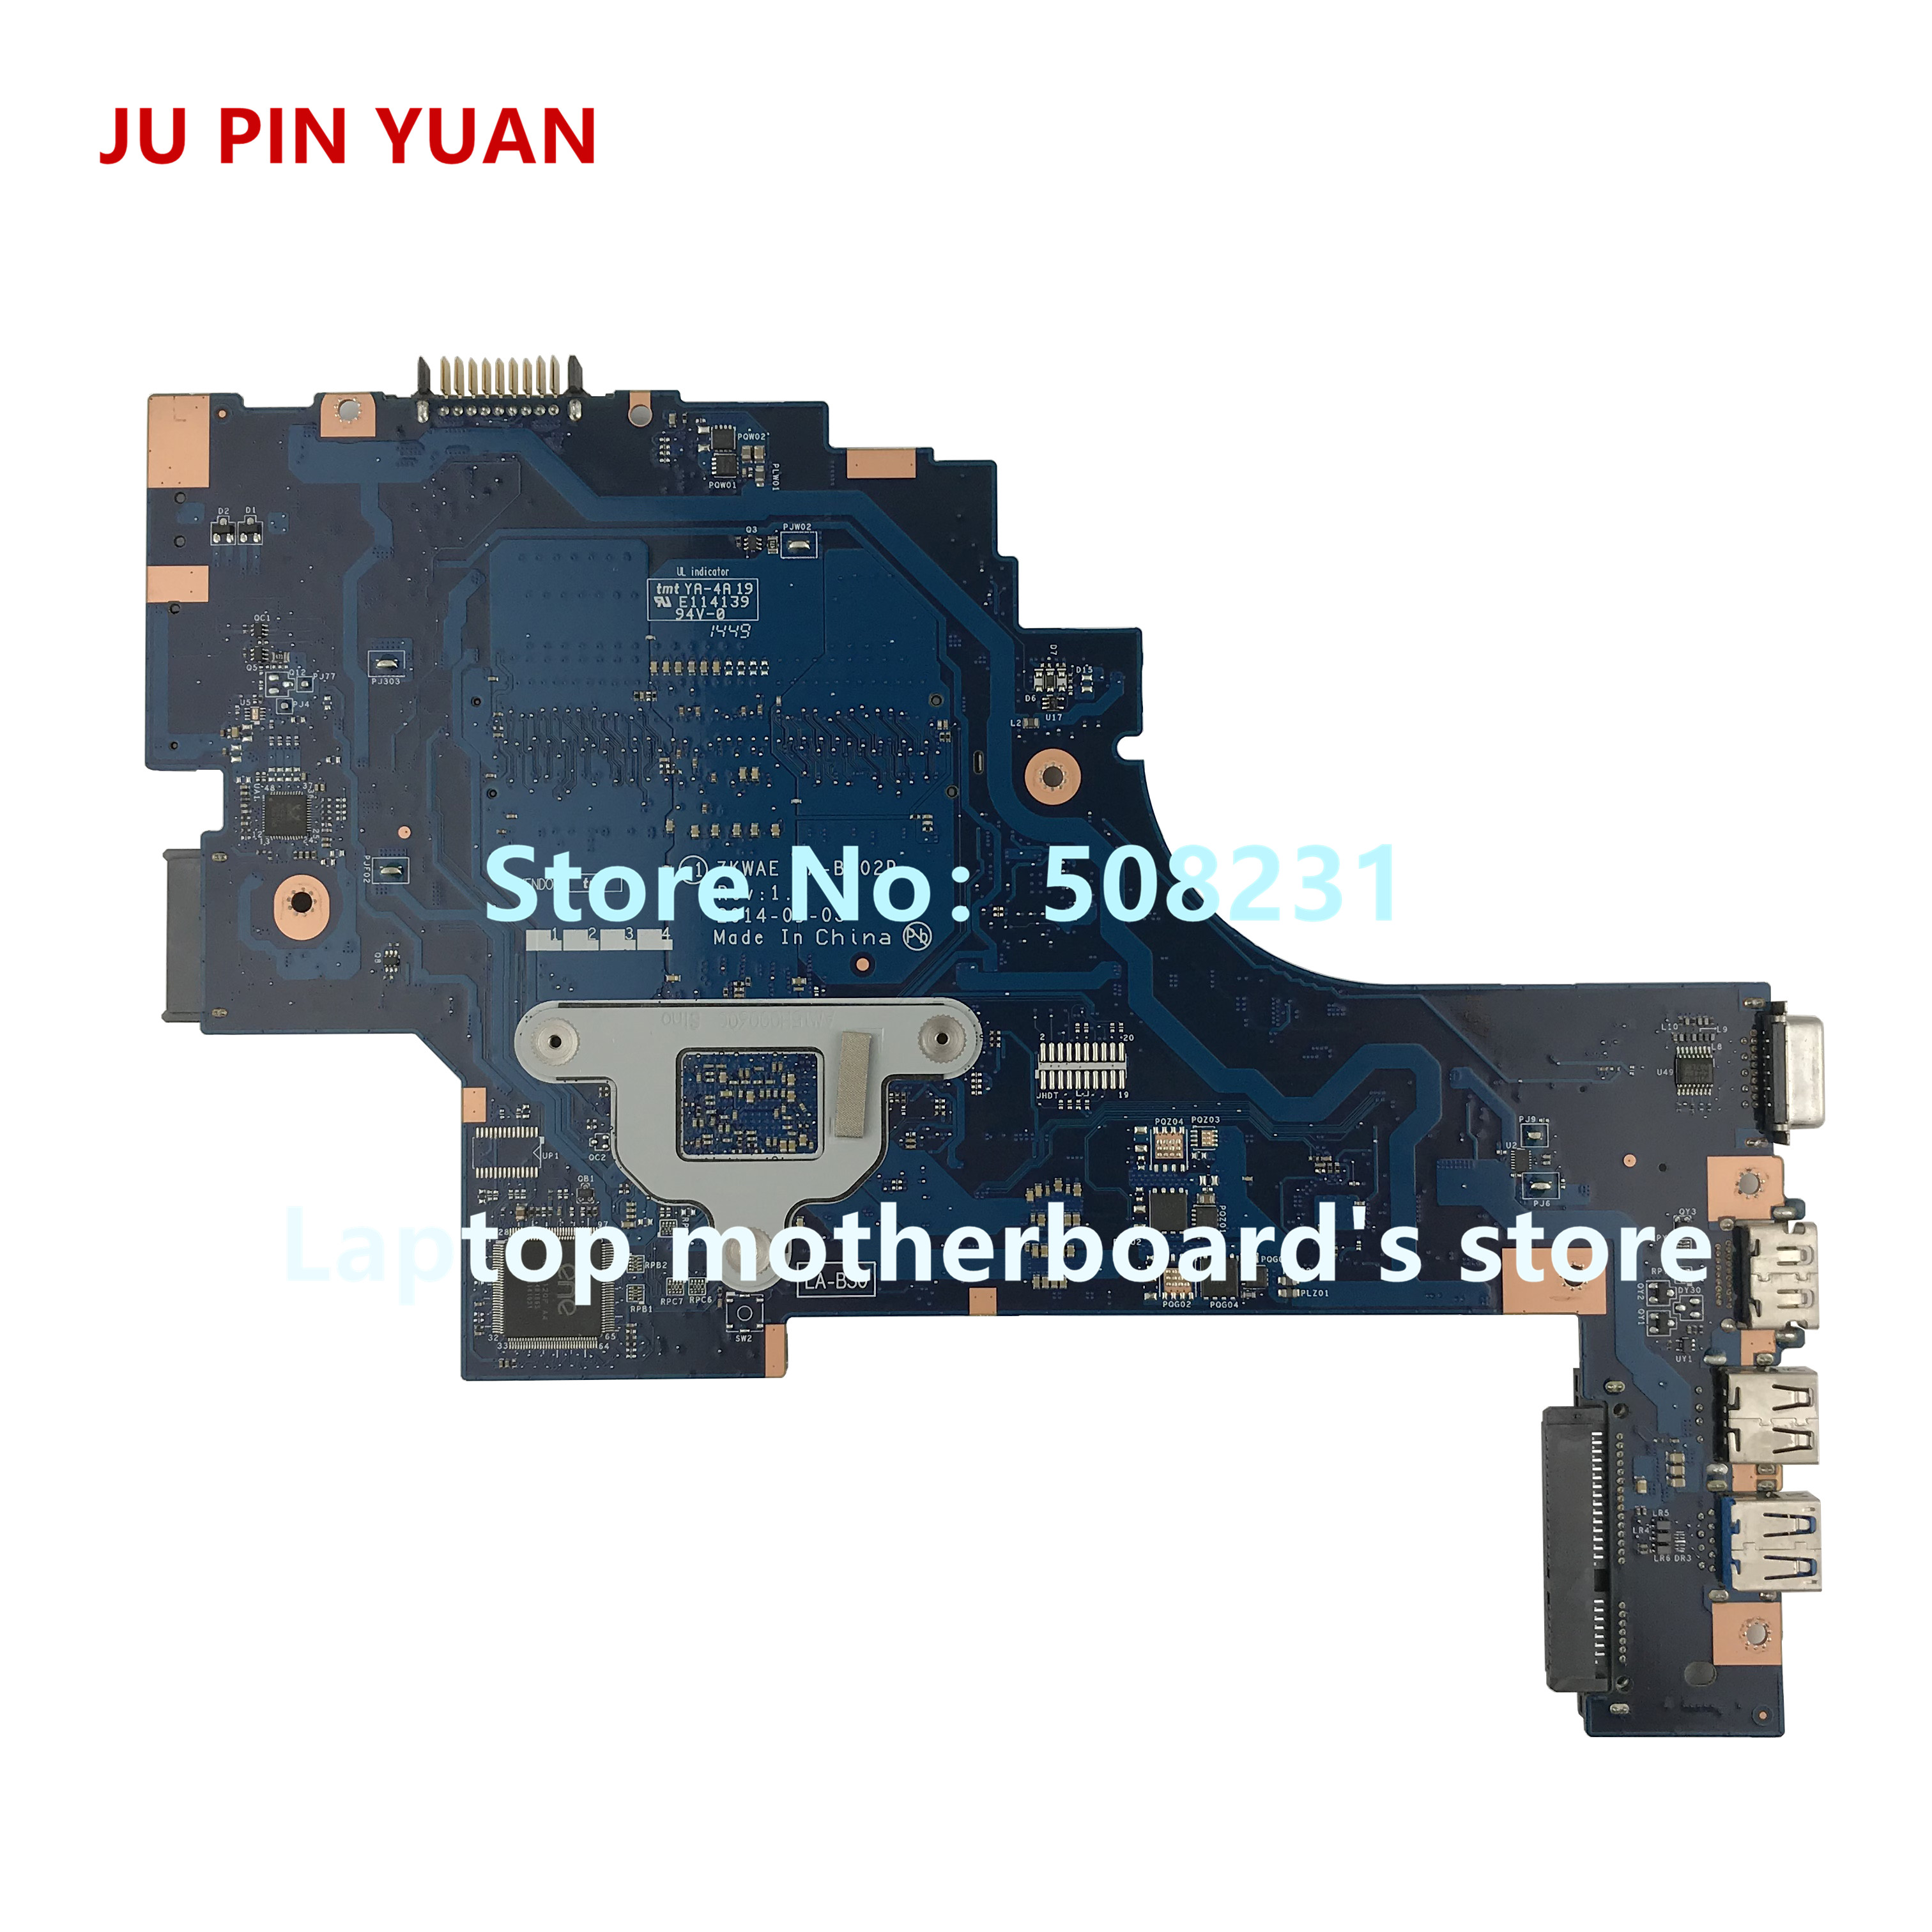 Купить с кэшбэком JU PIN YUAN K000891410 ZKWAE LA-302P for TOSHIBA Satellite C50D C55D C55D-B C55D-B5310 Laptop Motherboard with A8-6410 2.0GHz